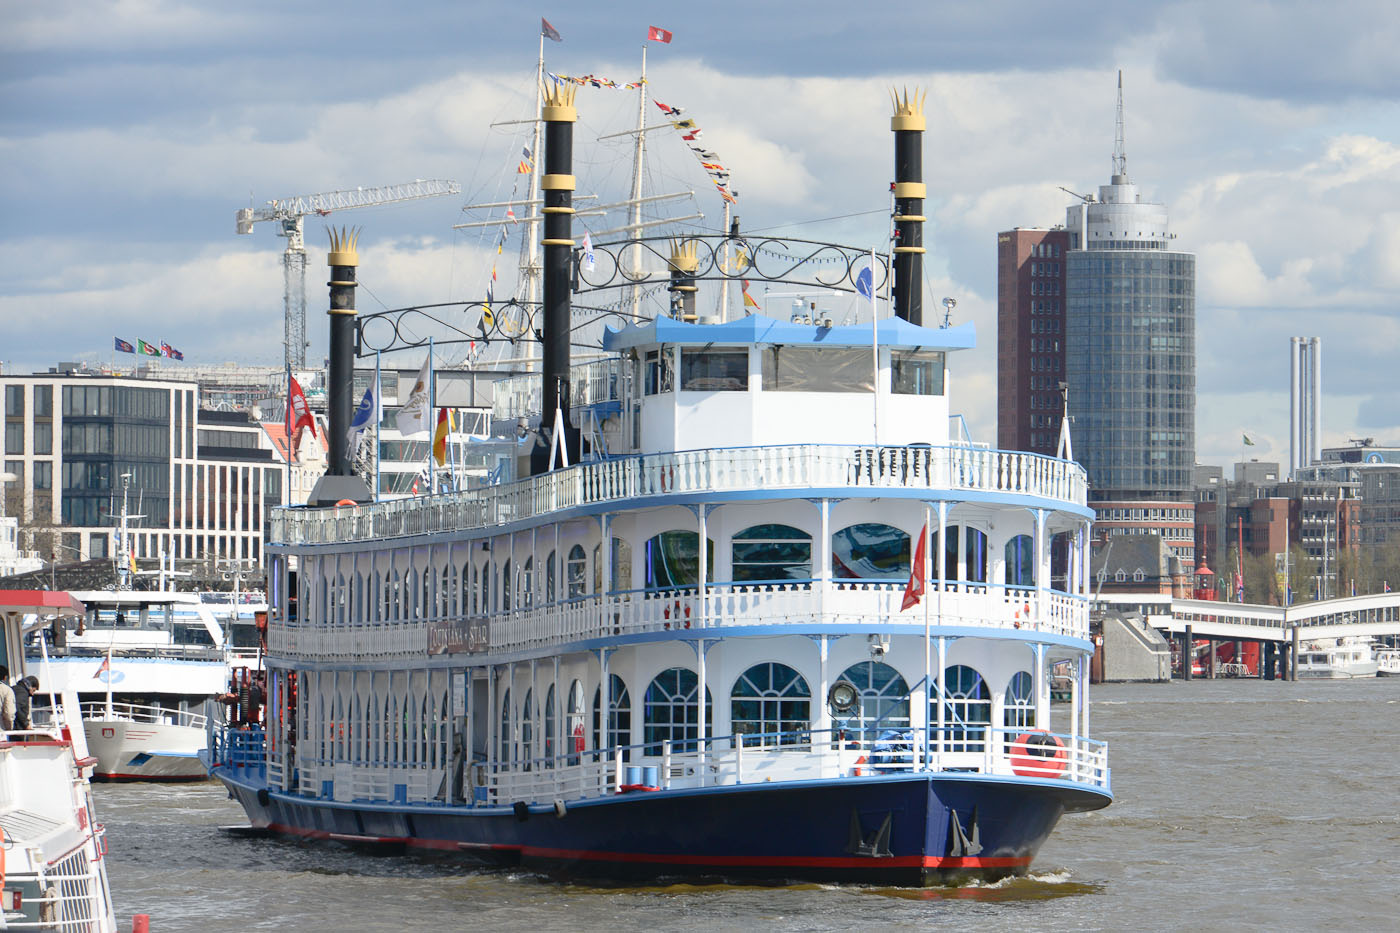 Foto ID 15042612 Lousiana Star, Hafenrundfahrt Hamburg